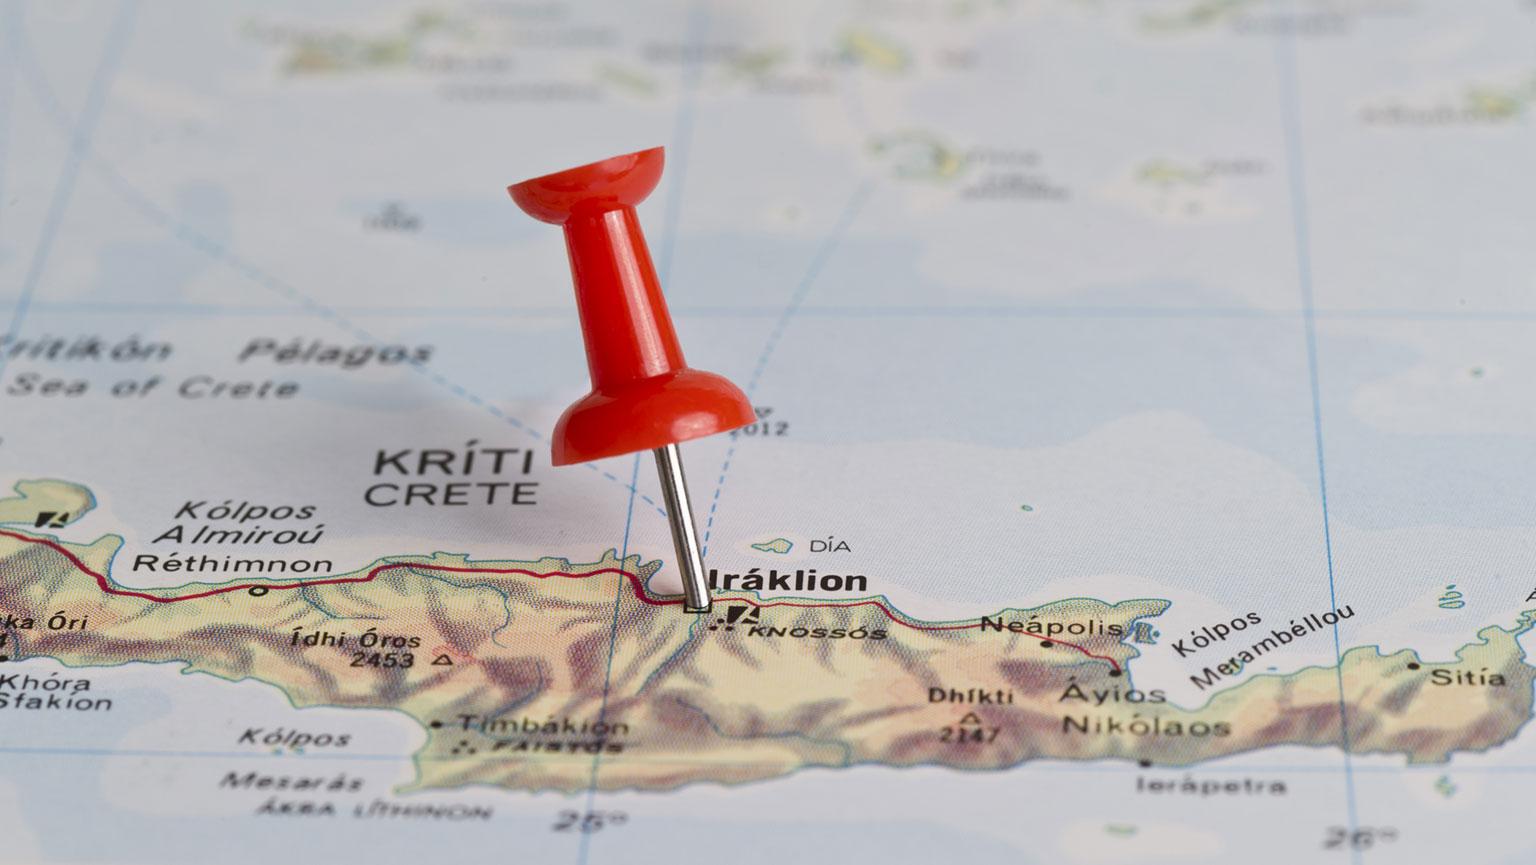 Exploring Crete—Realm of Ancient Minoans